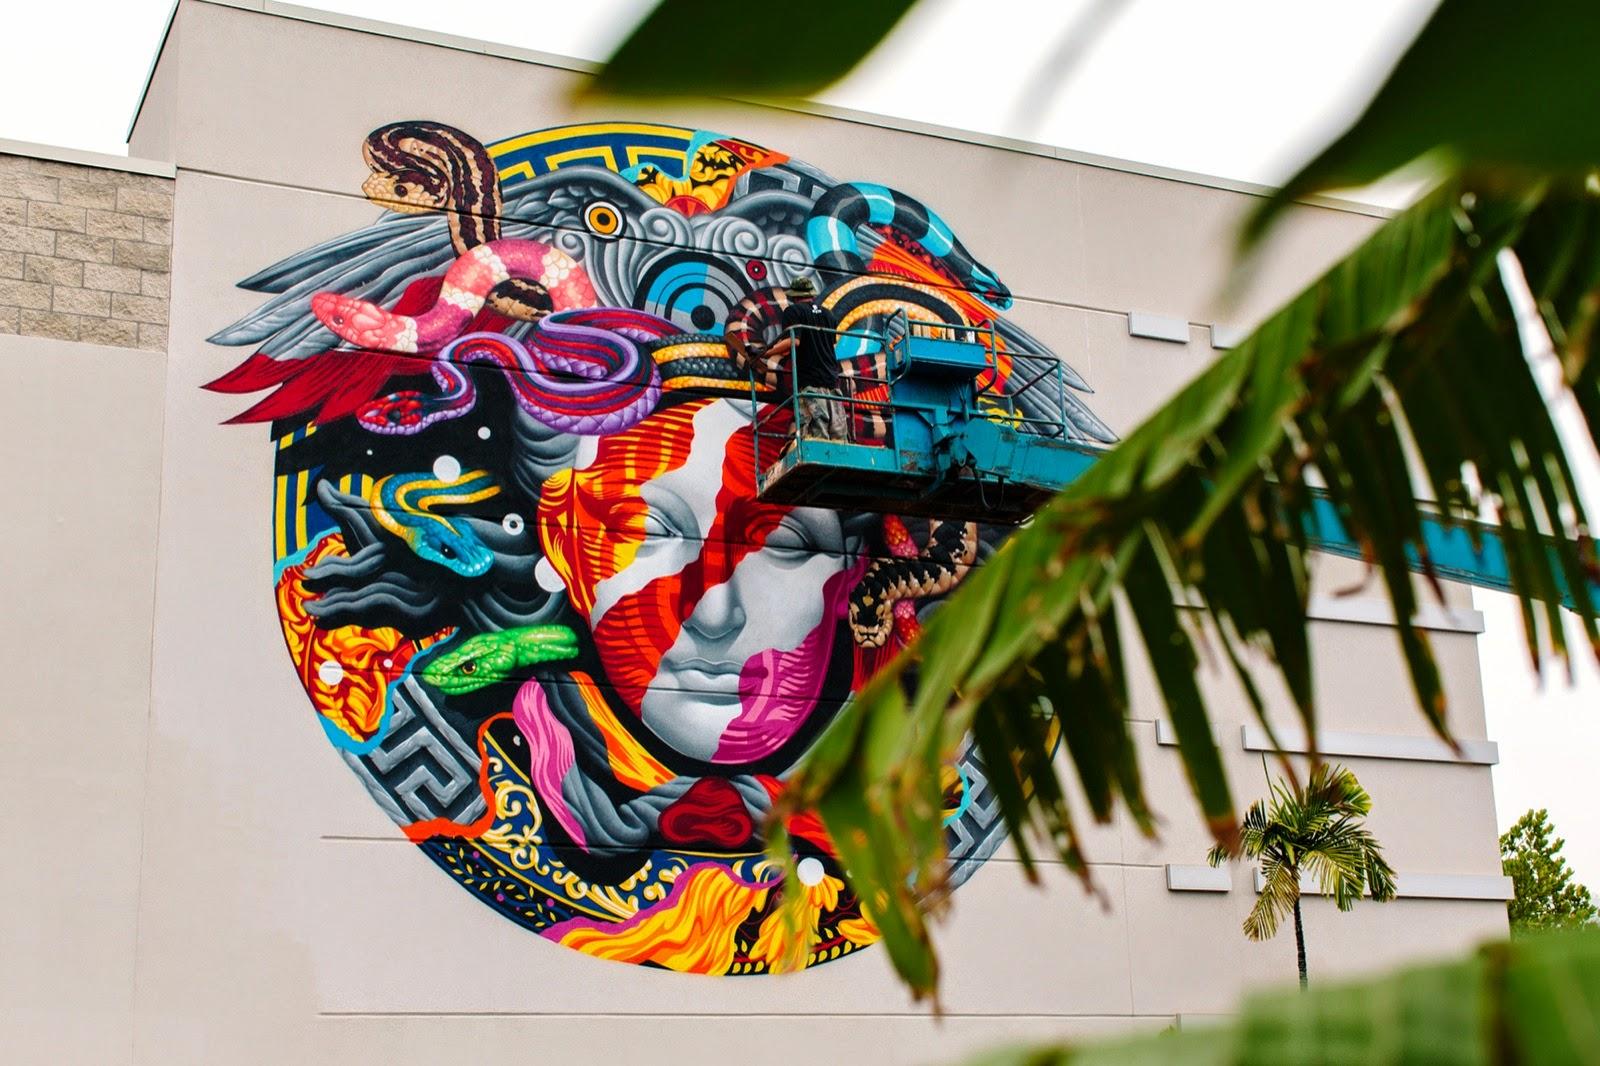 Tristan Eaton New Mural For Versace & POW! WOW! - Honolulu, Hawaii